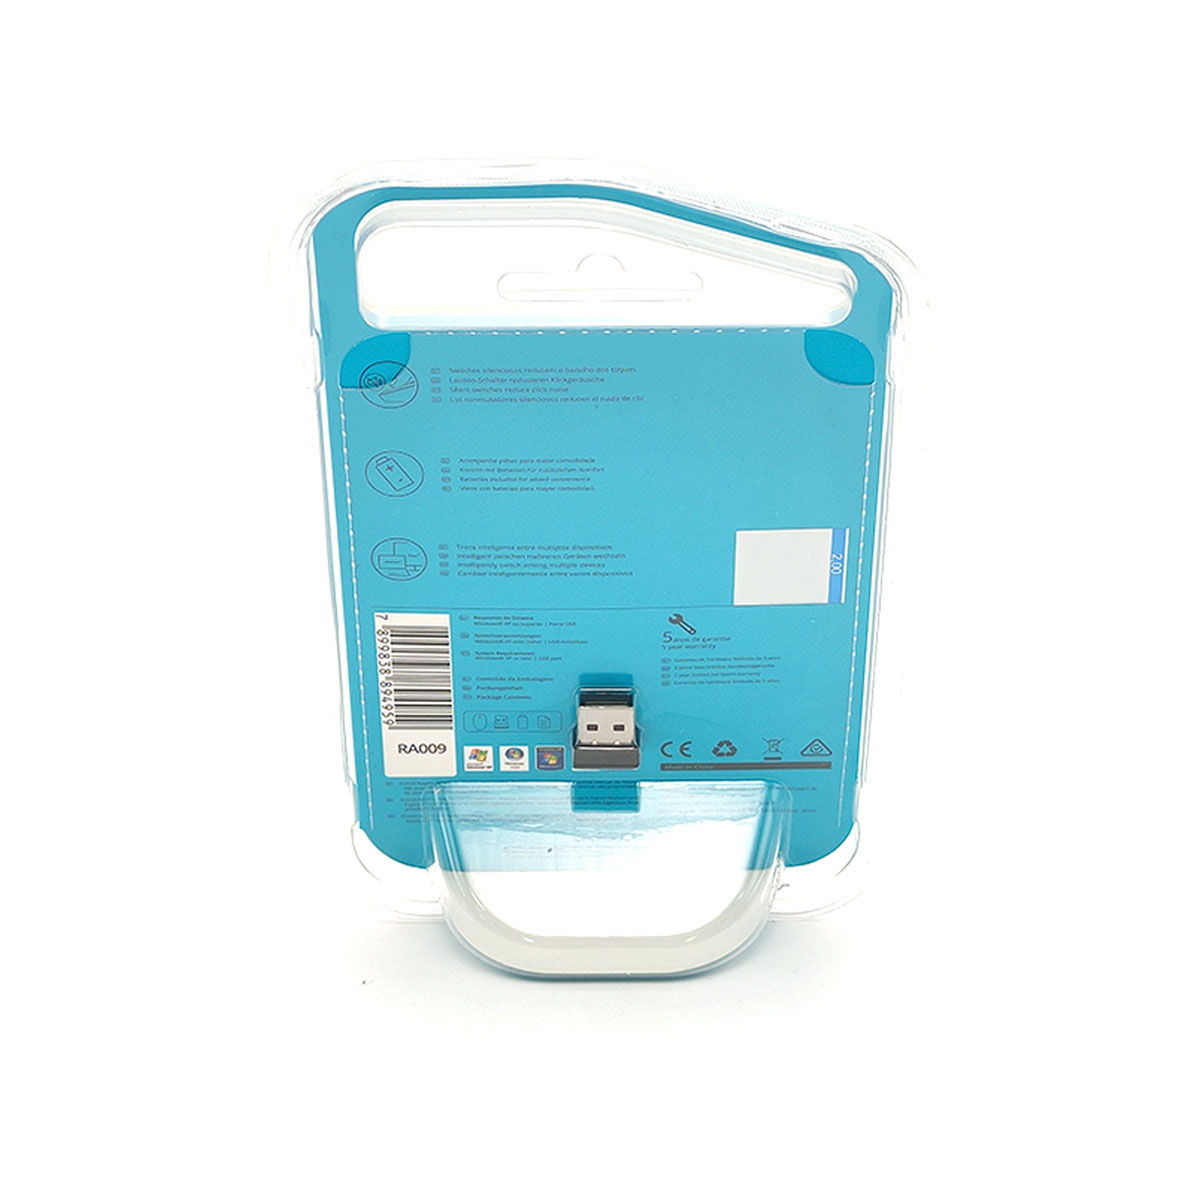 Mouse Rapoo M100 Silent, Wireless 2.4 GHz, Bluetooth, 1000 DPI, Clique Silencioso, Preto - RA009